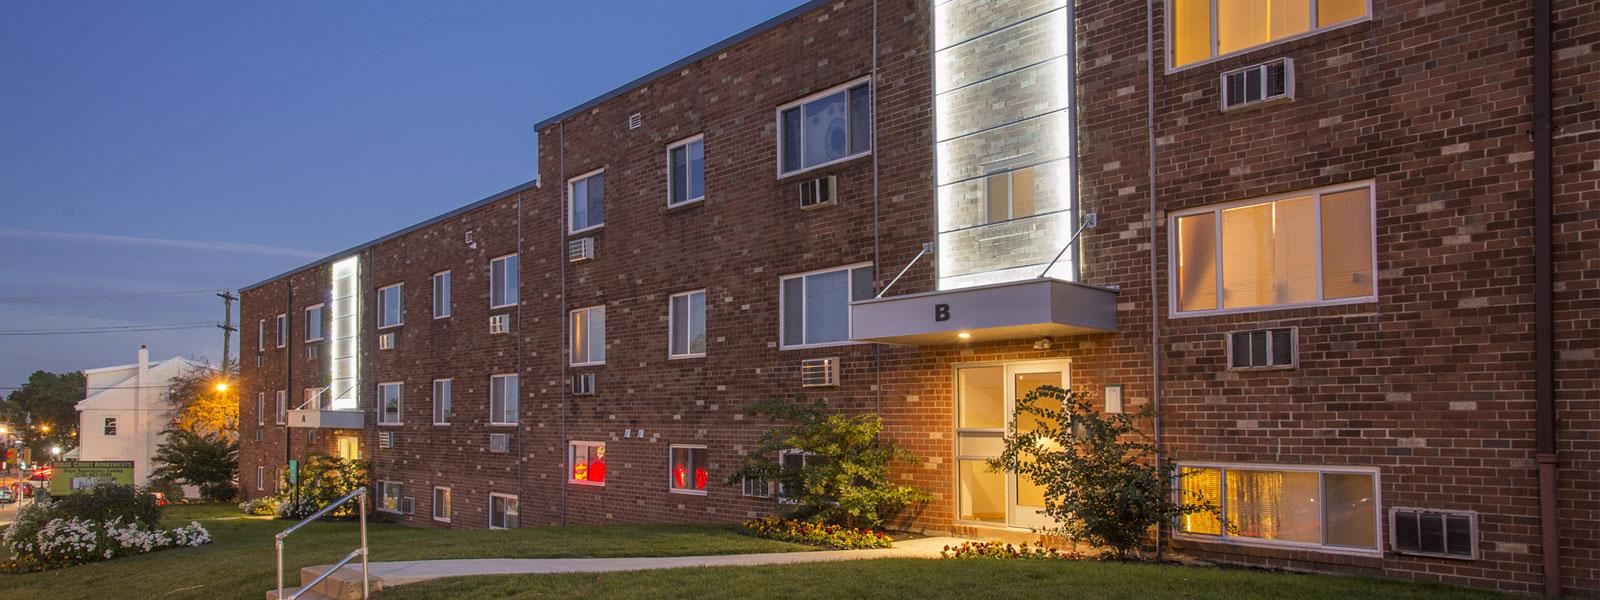 ridge court roxborough apartments near manayunk for rent